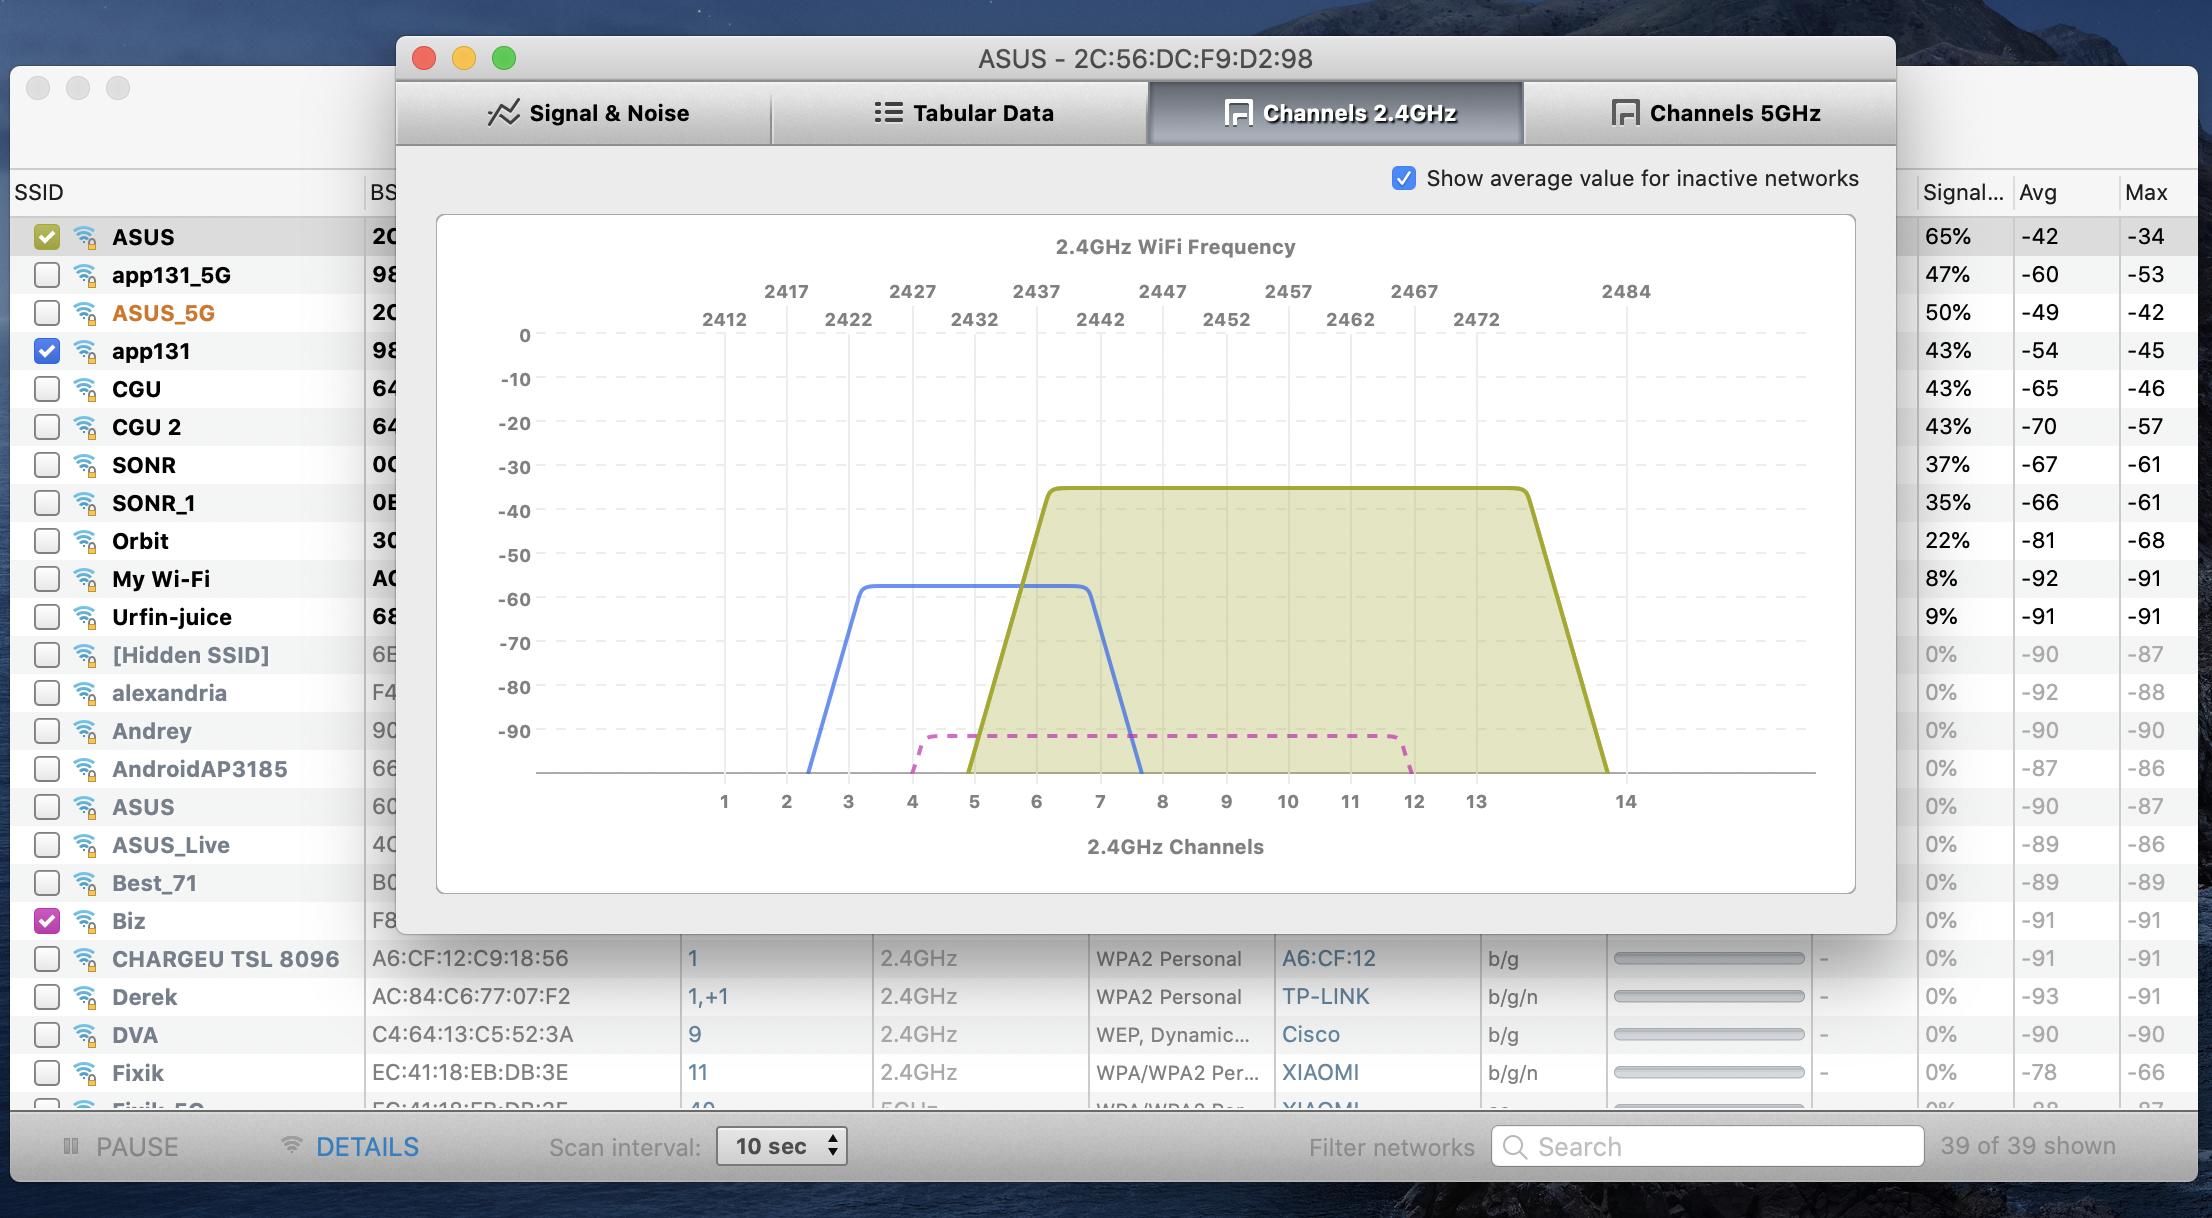 netspot networks signal details